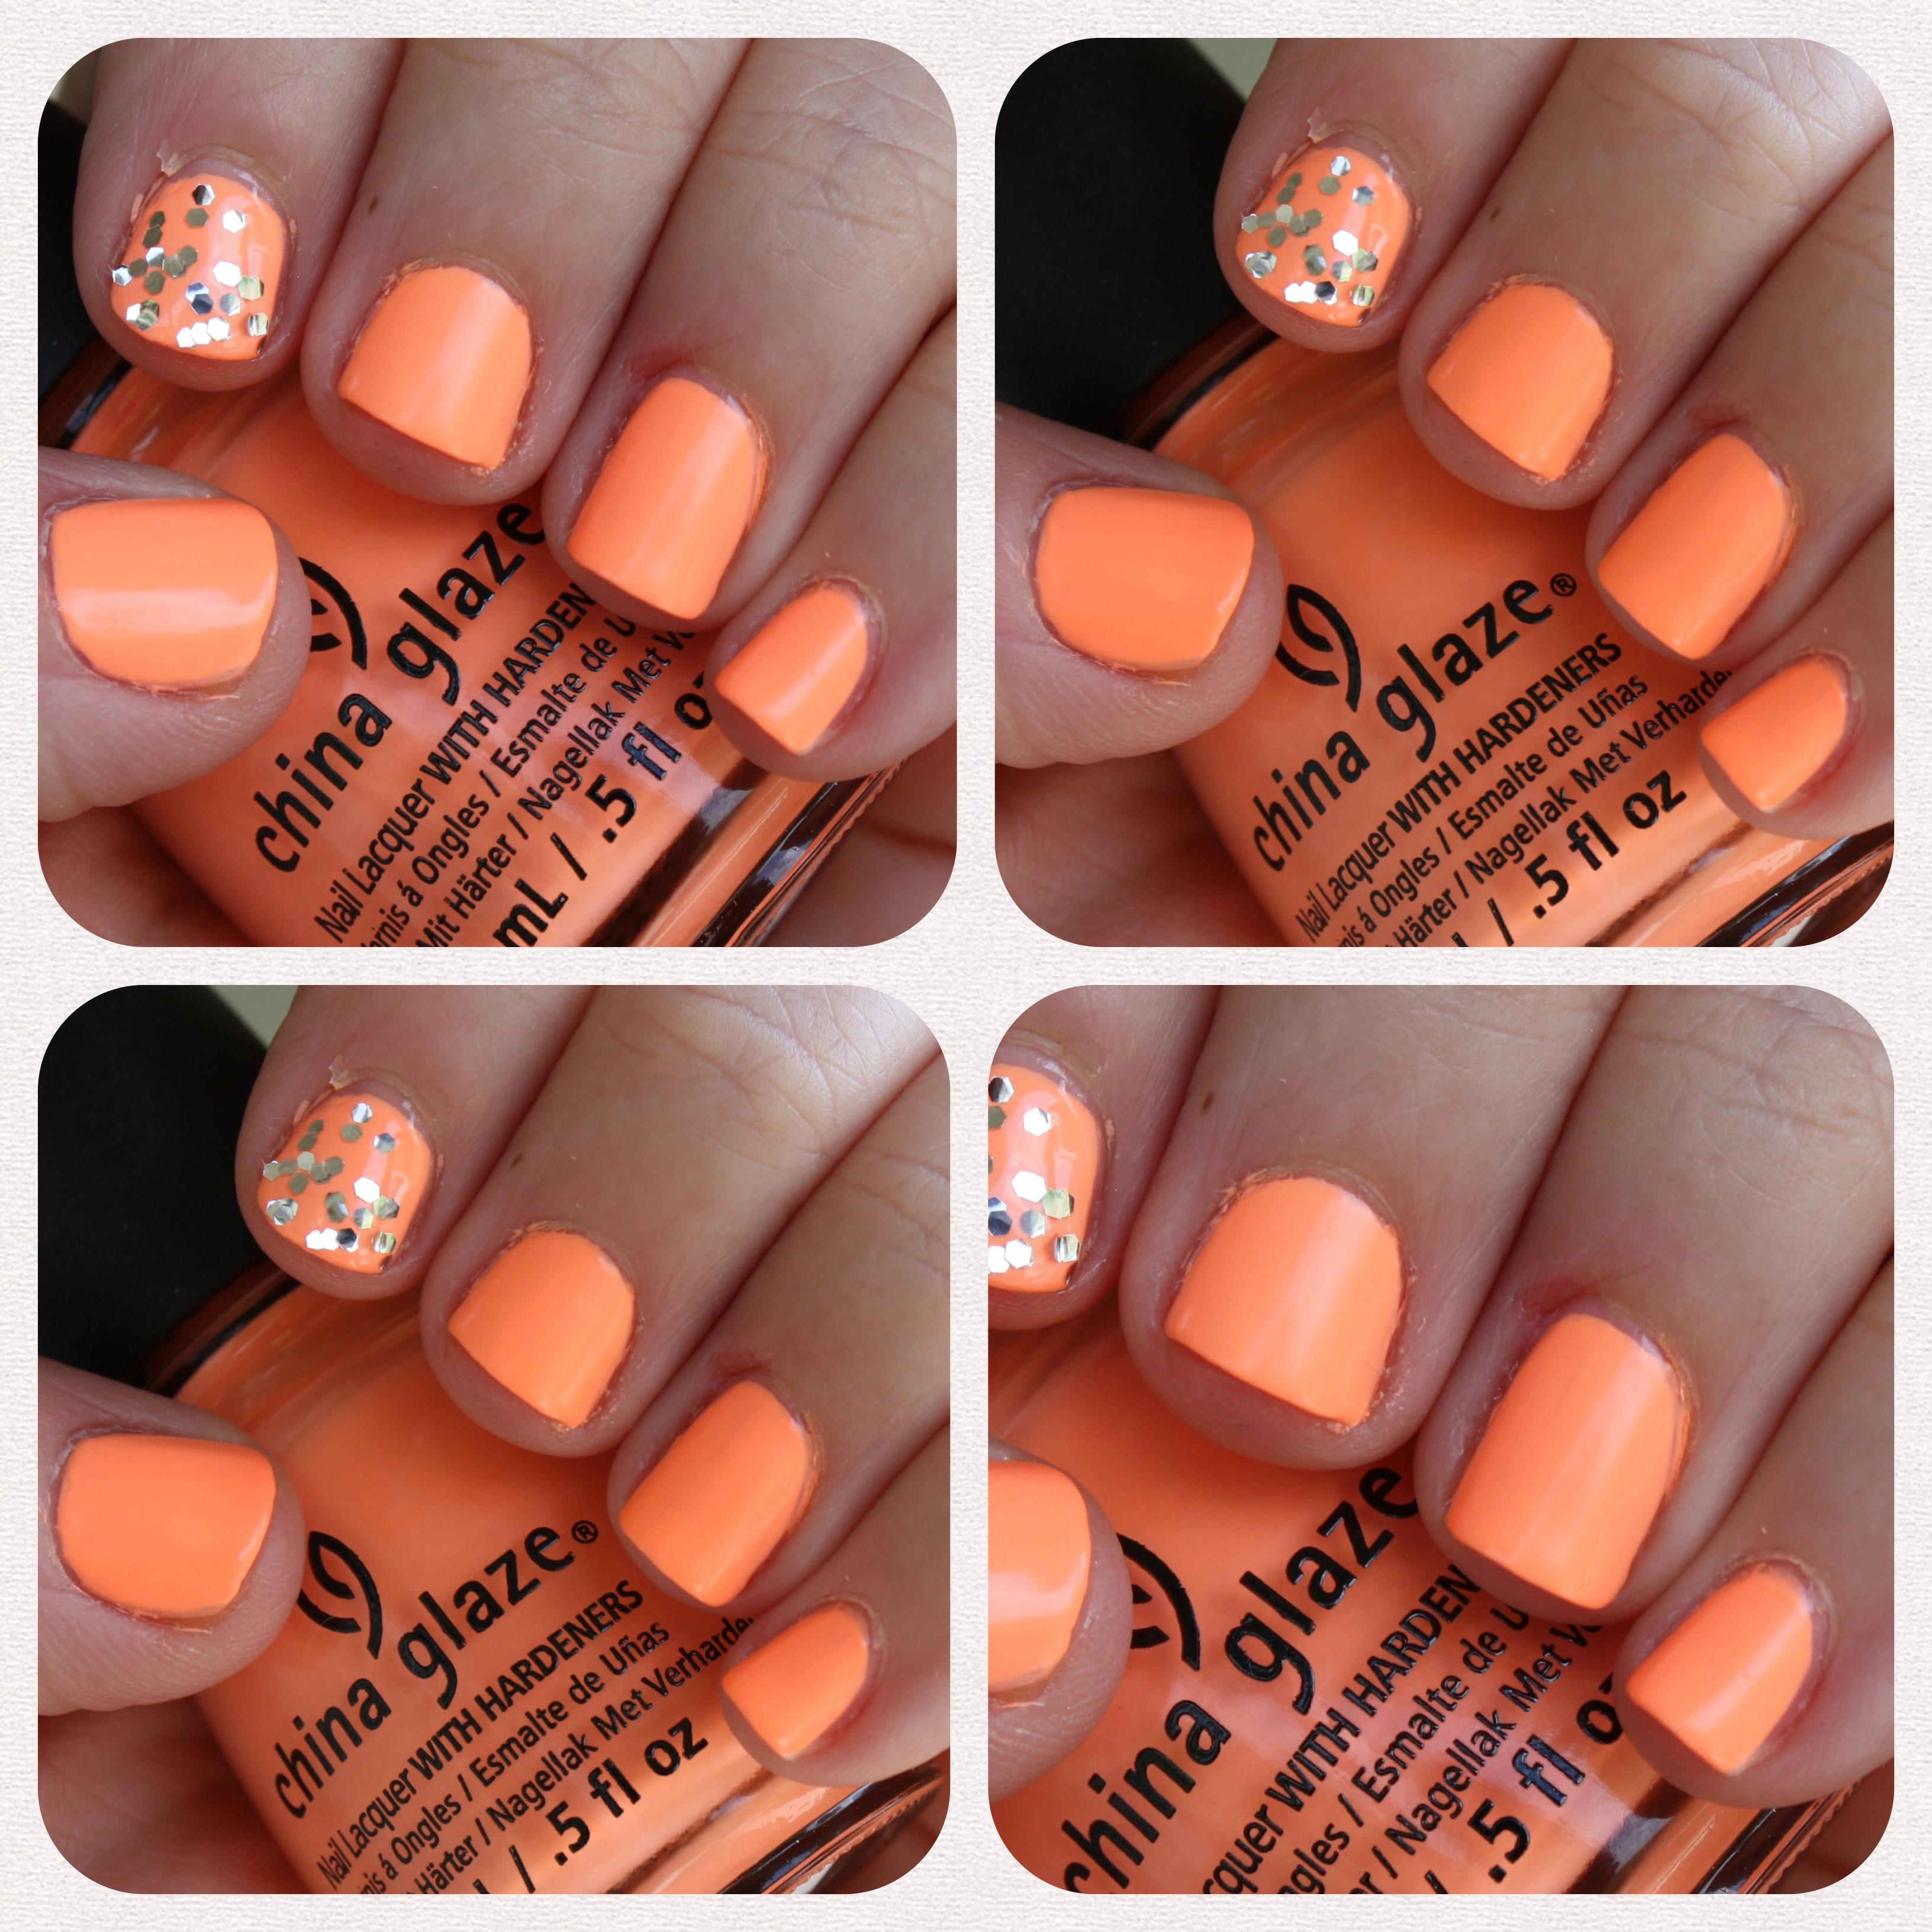 China Glaze Son of a Peach – horrendous color